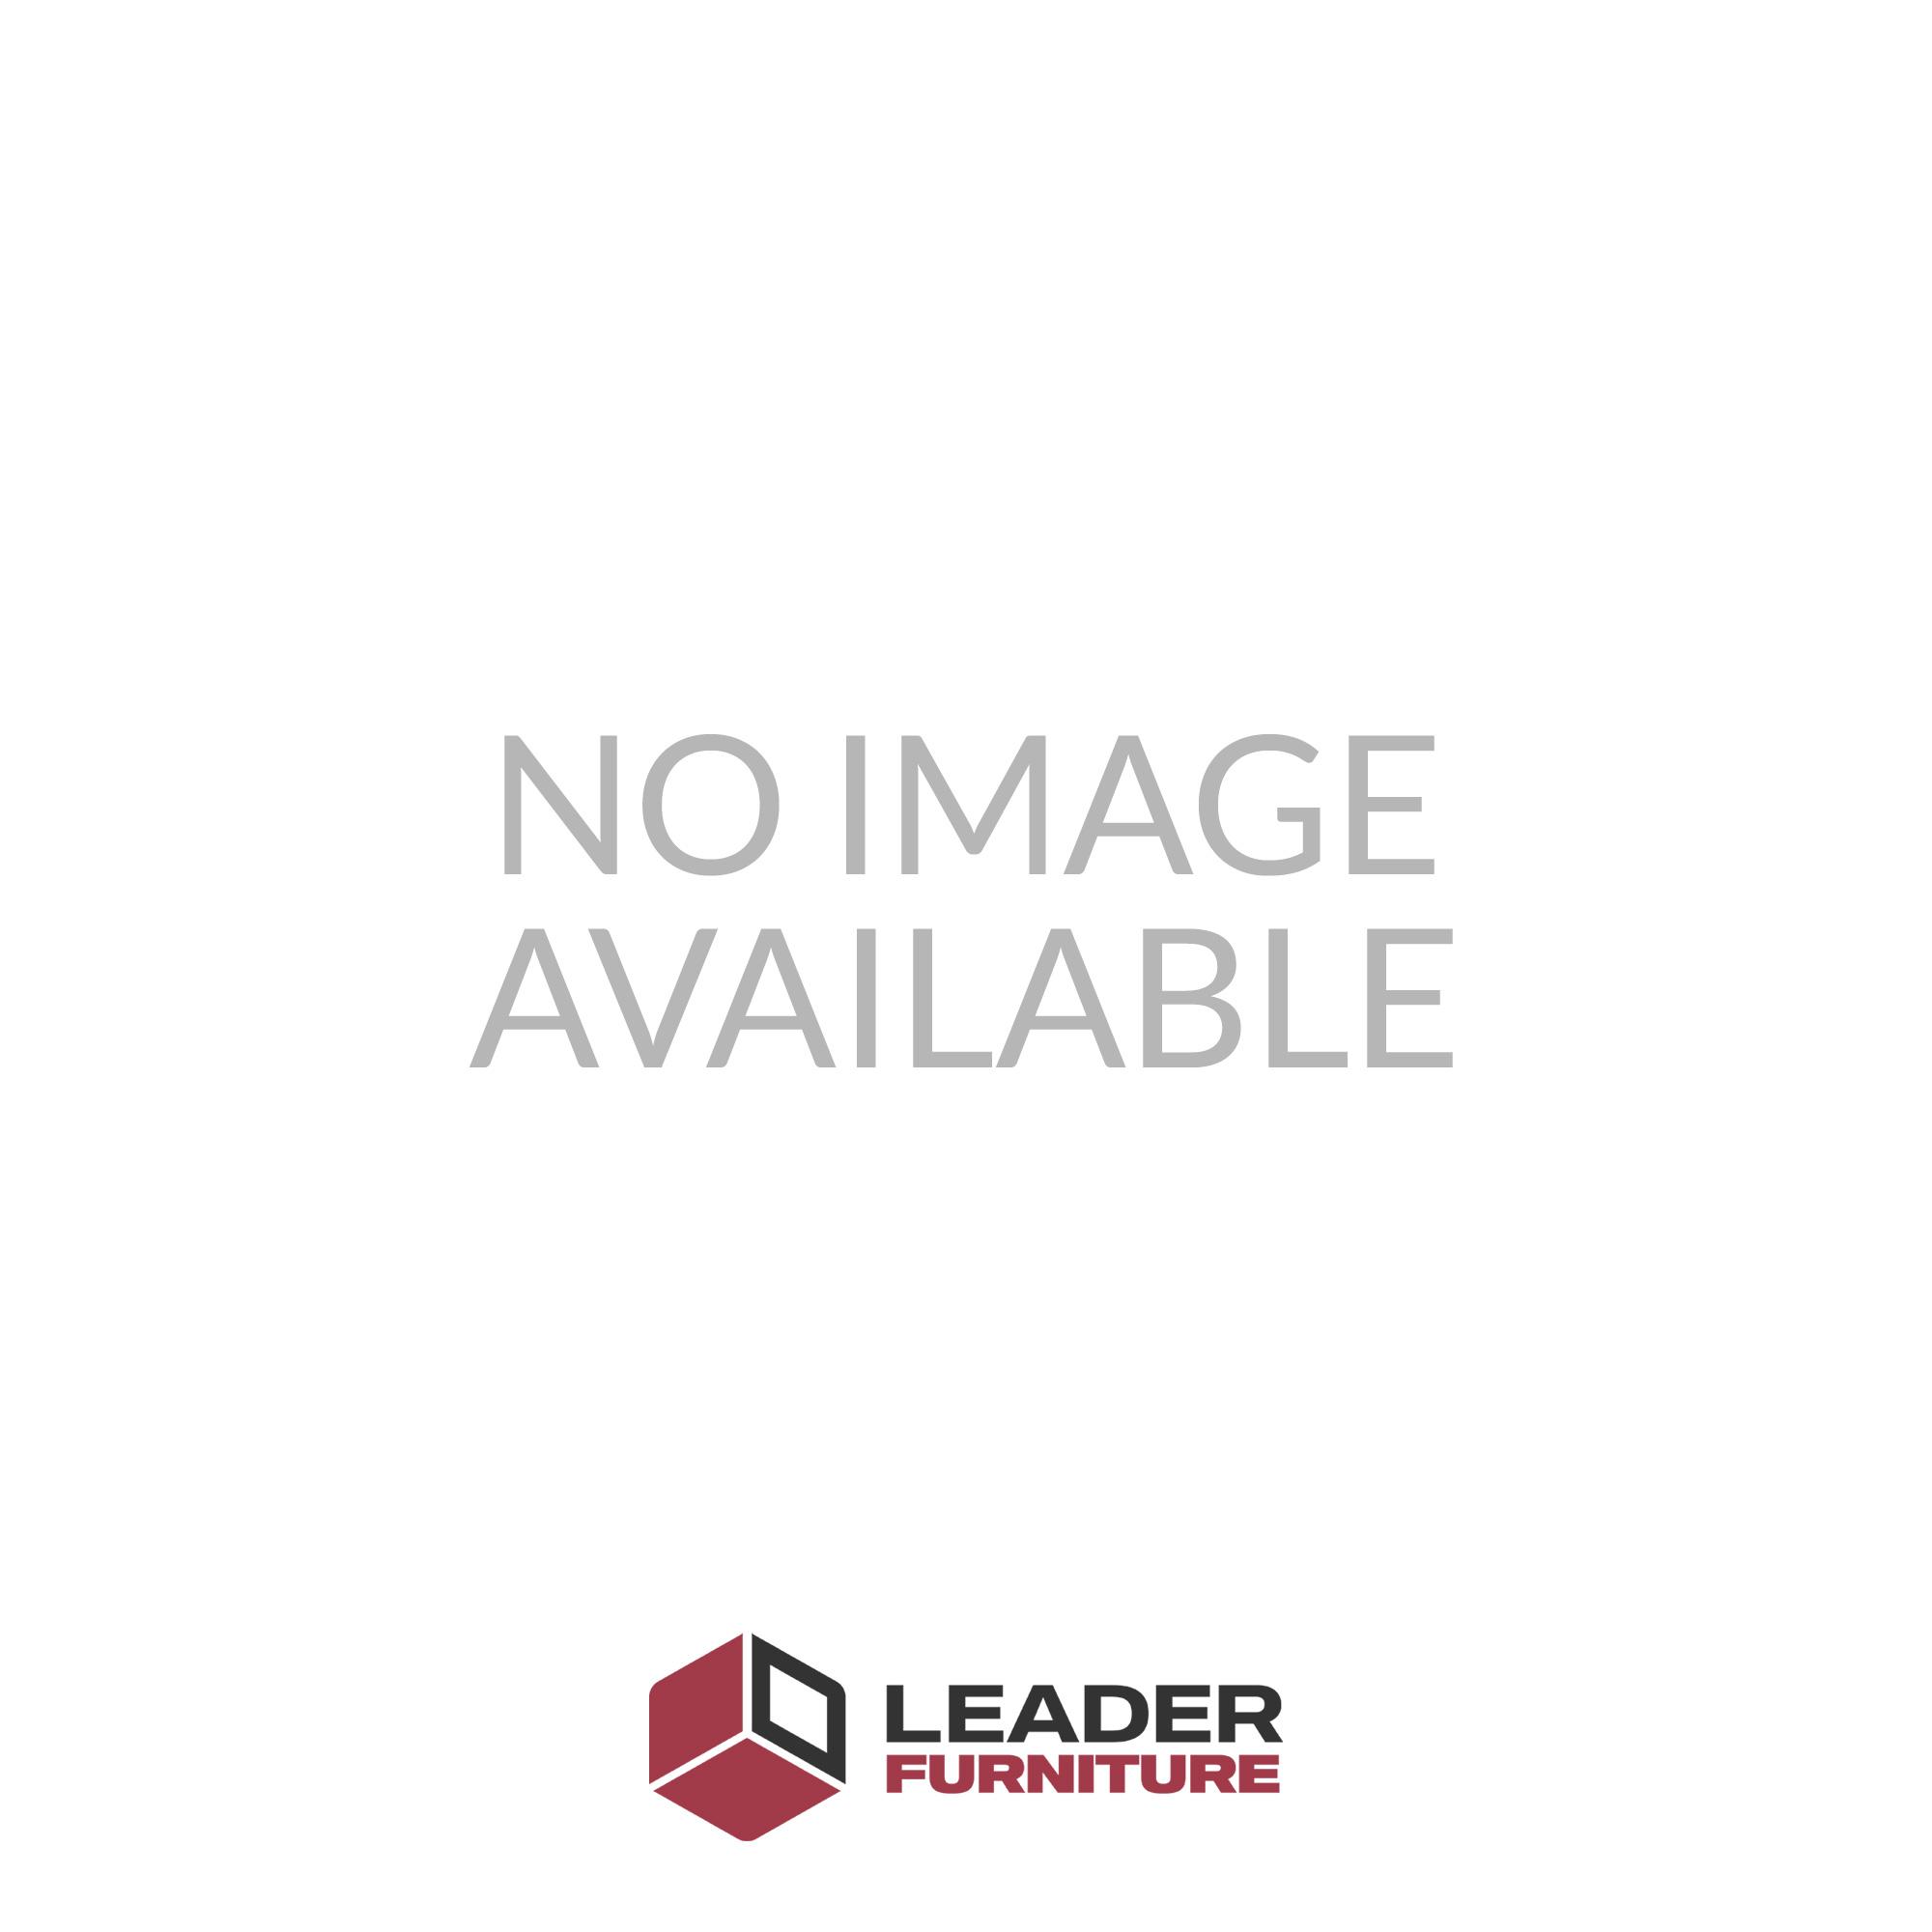 Supergloss Carrara White White Maxi V5 Micro Groove Laminate Flooring